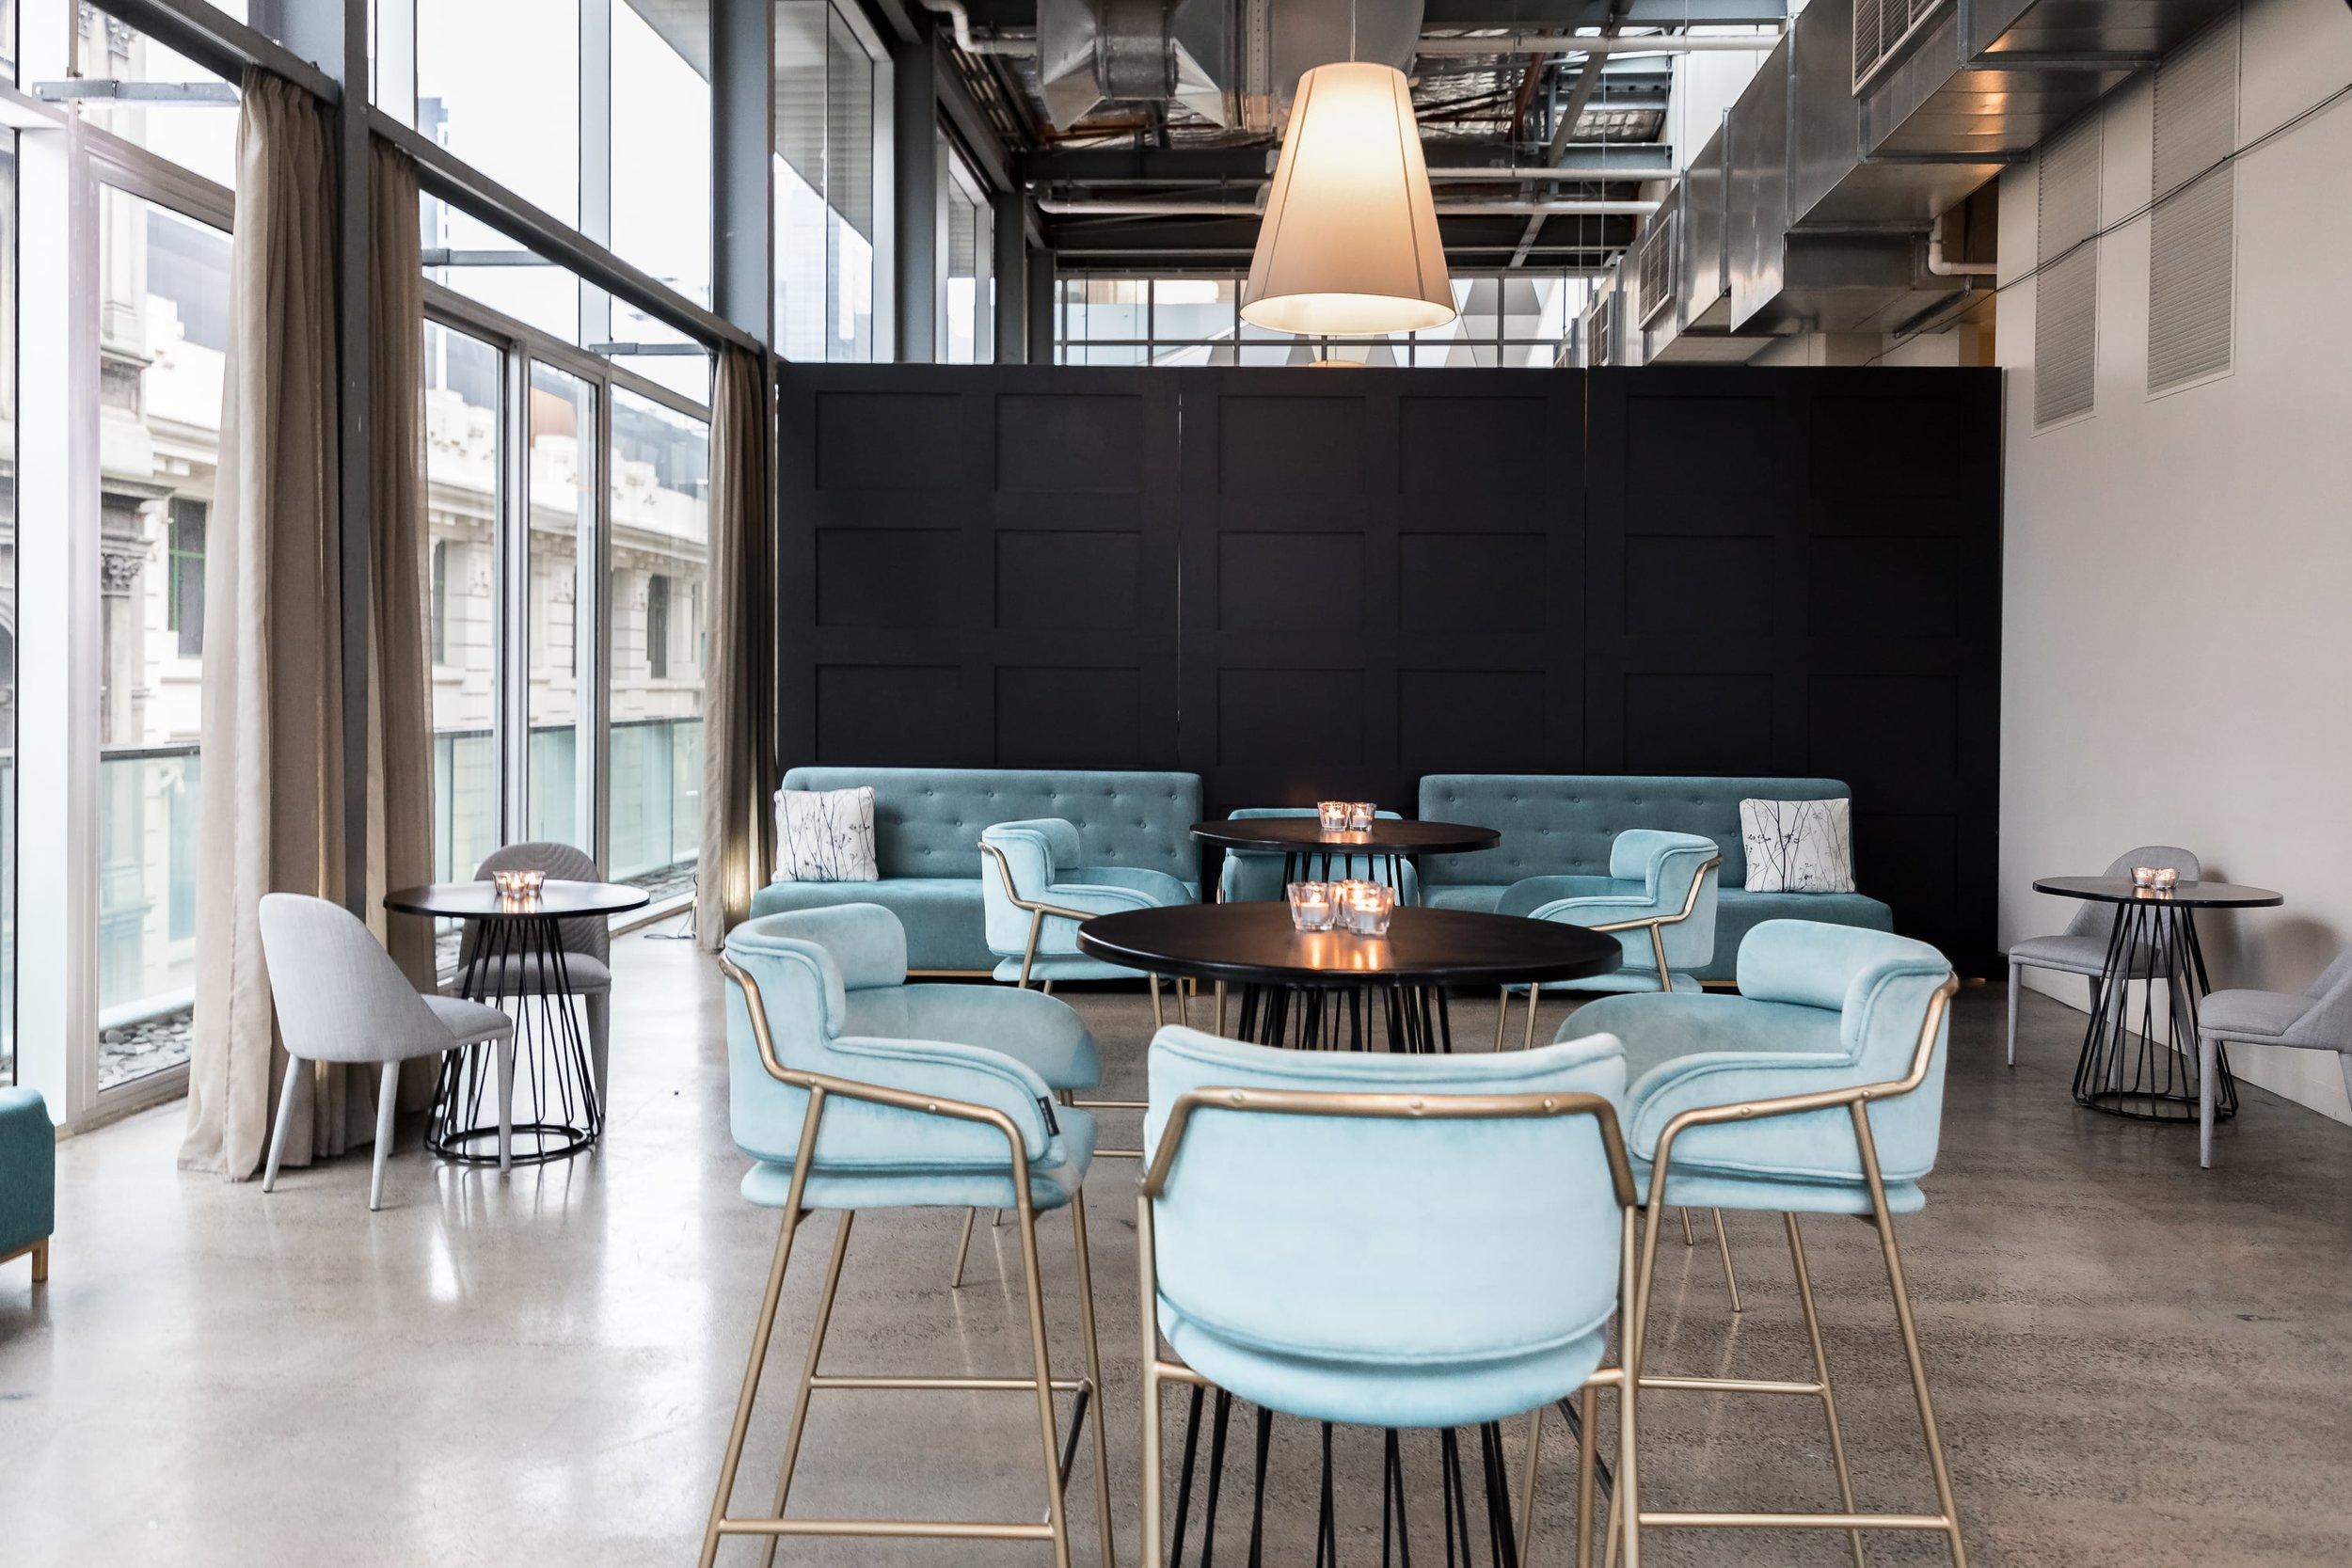 Furniture configuration at ALTO Event Space in the Melbourne CBD.